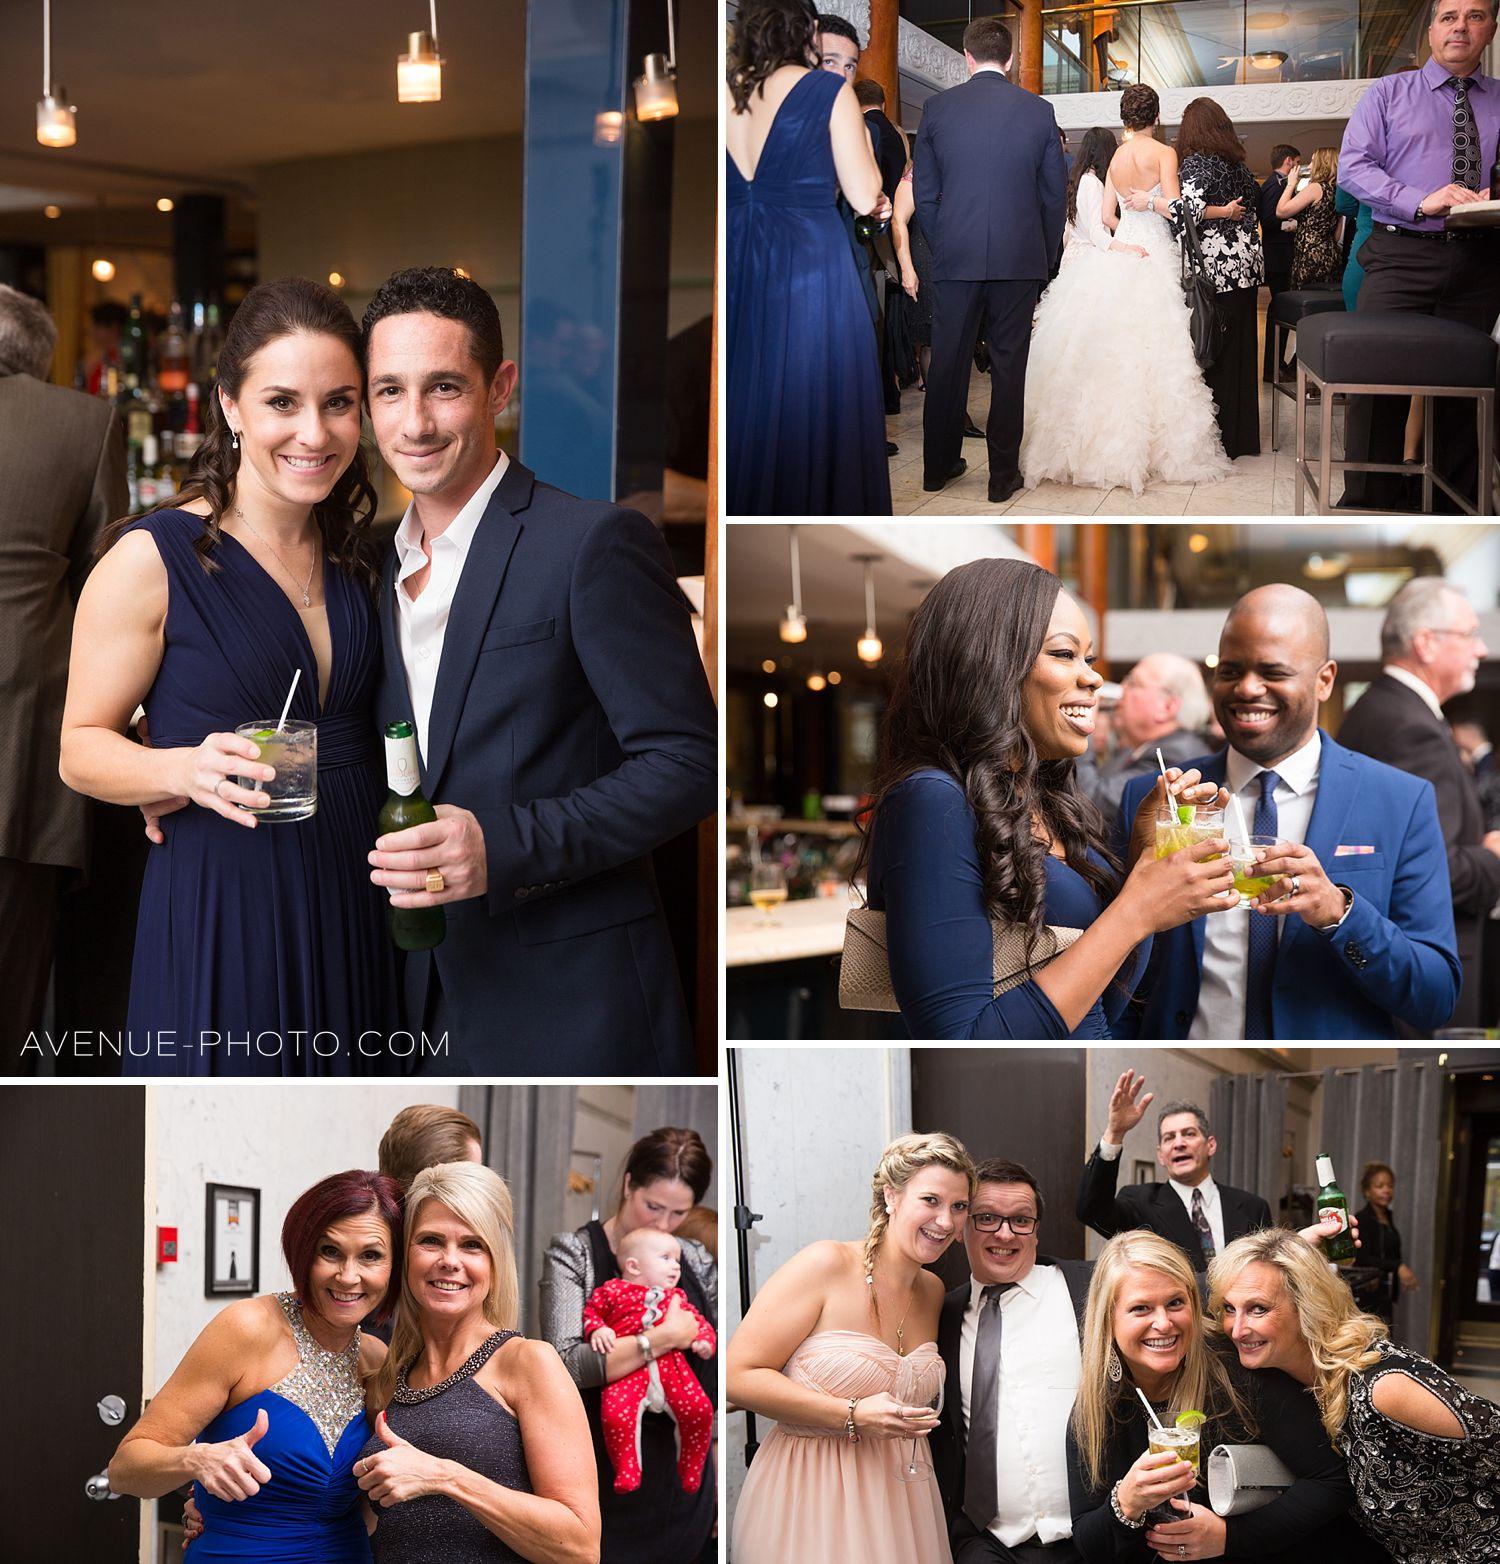 Rosewater Room Wedding Photos Sj Avenuephoto 041 Toronto Wedding Photographer Avenue Photo